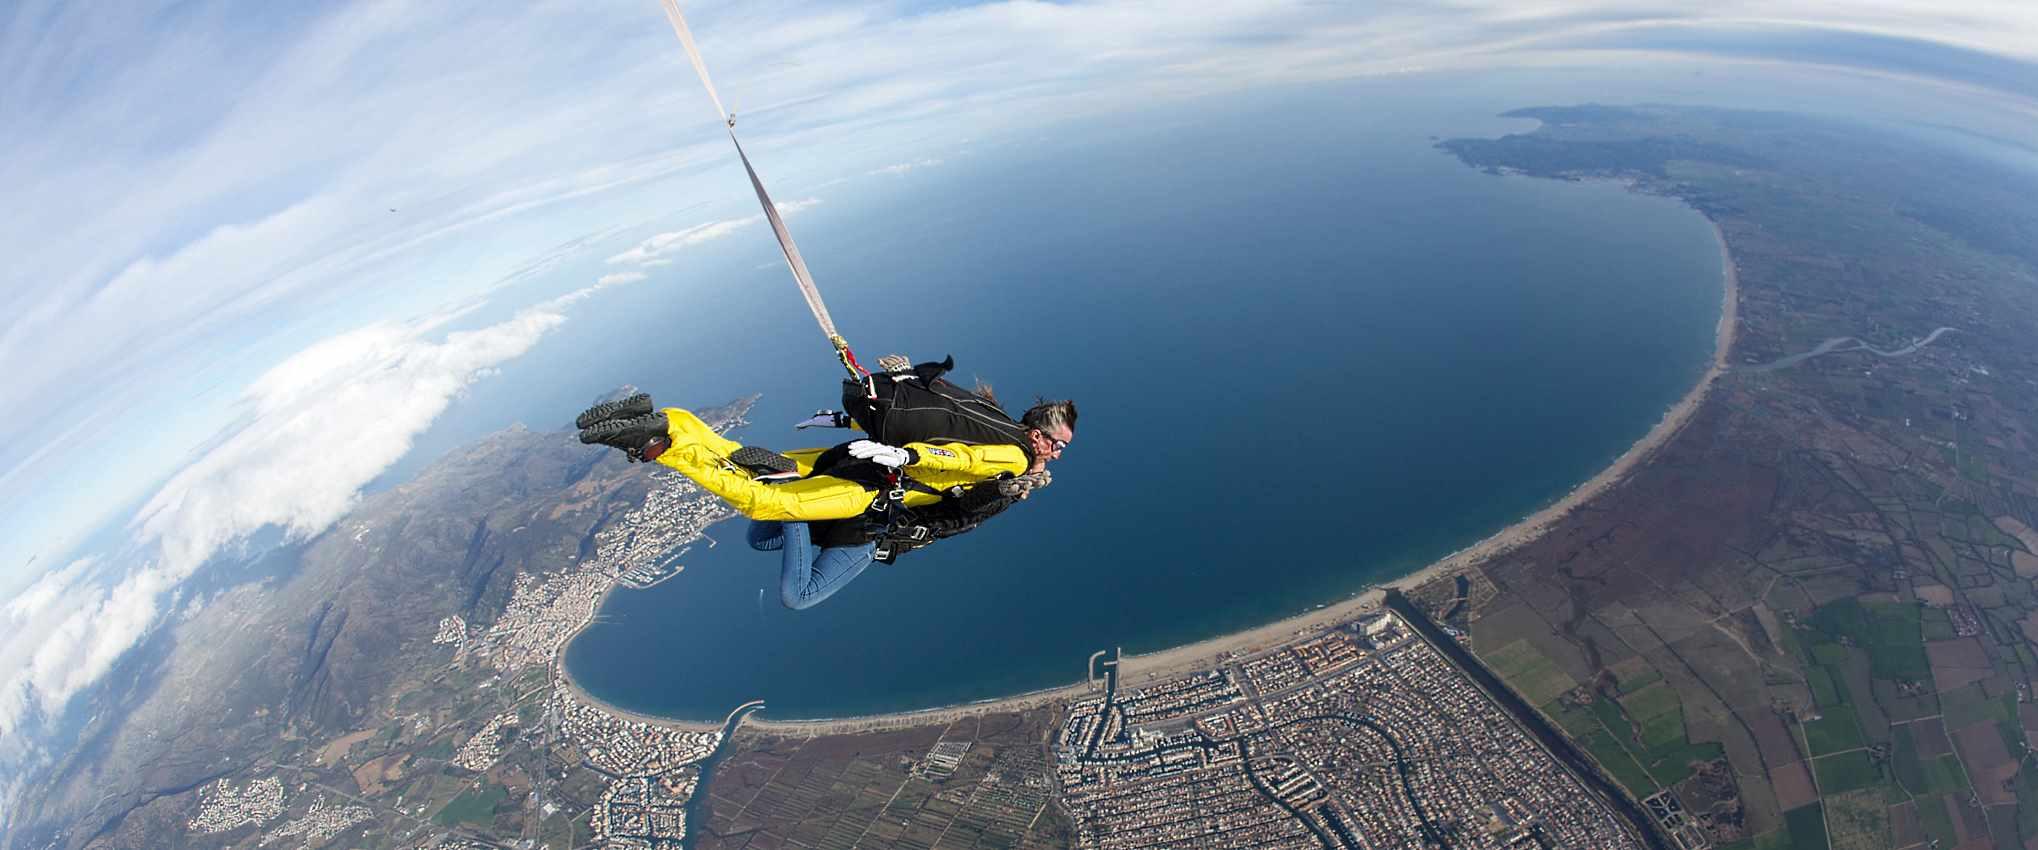 Costa Brava Paragliding